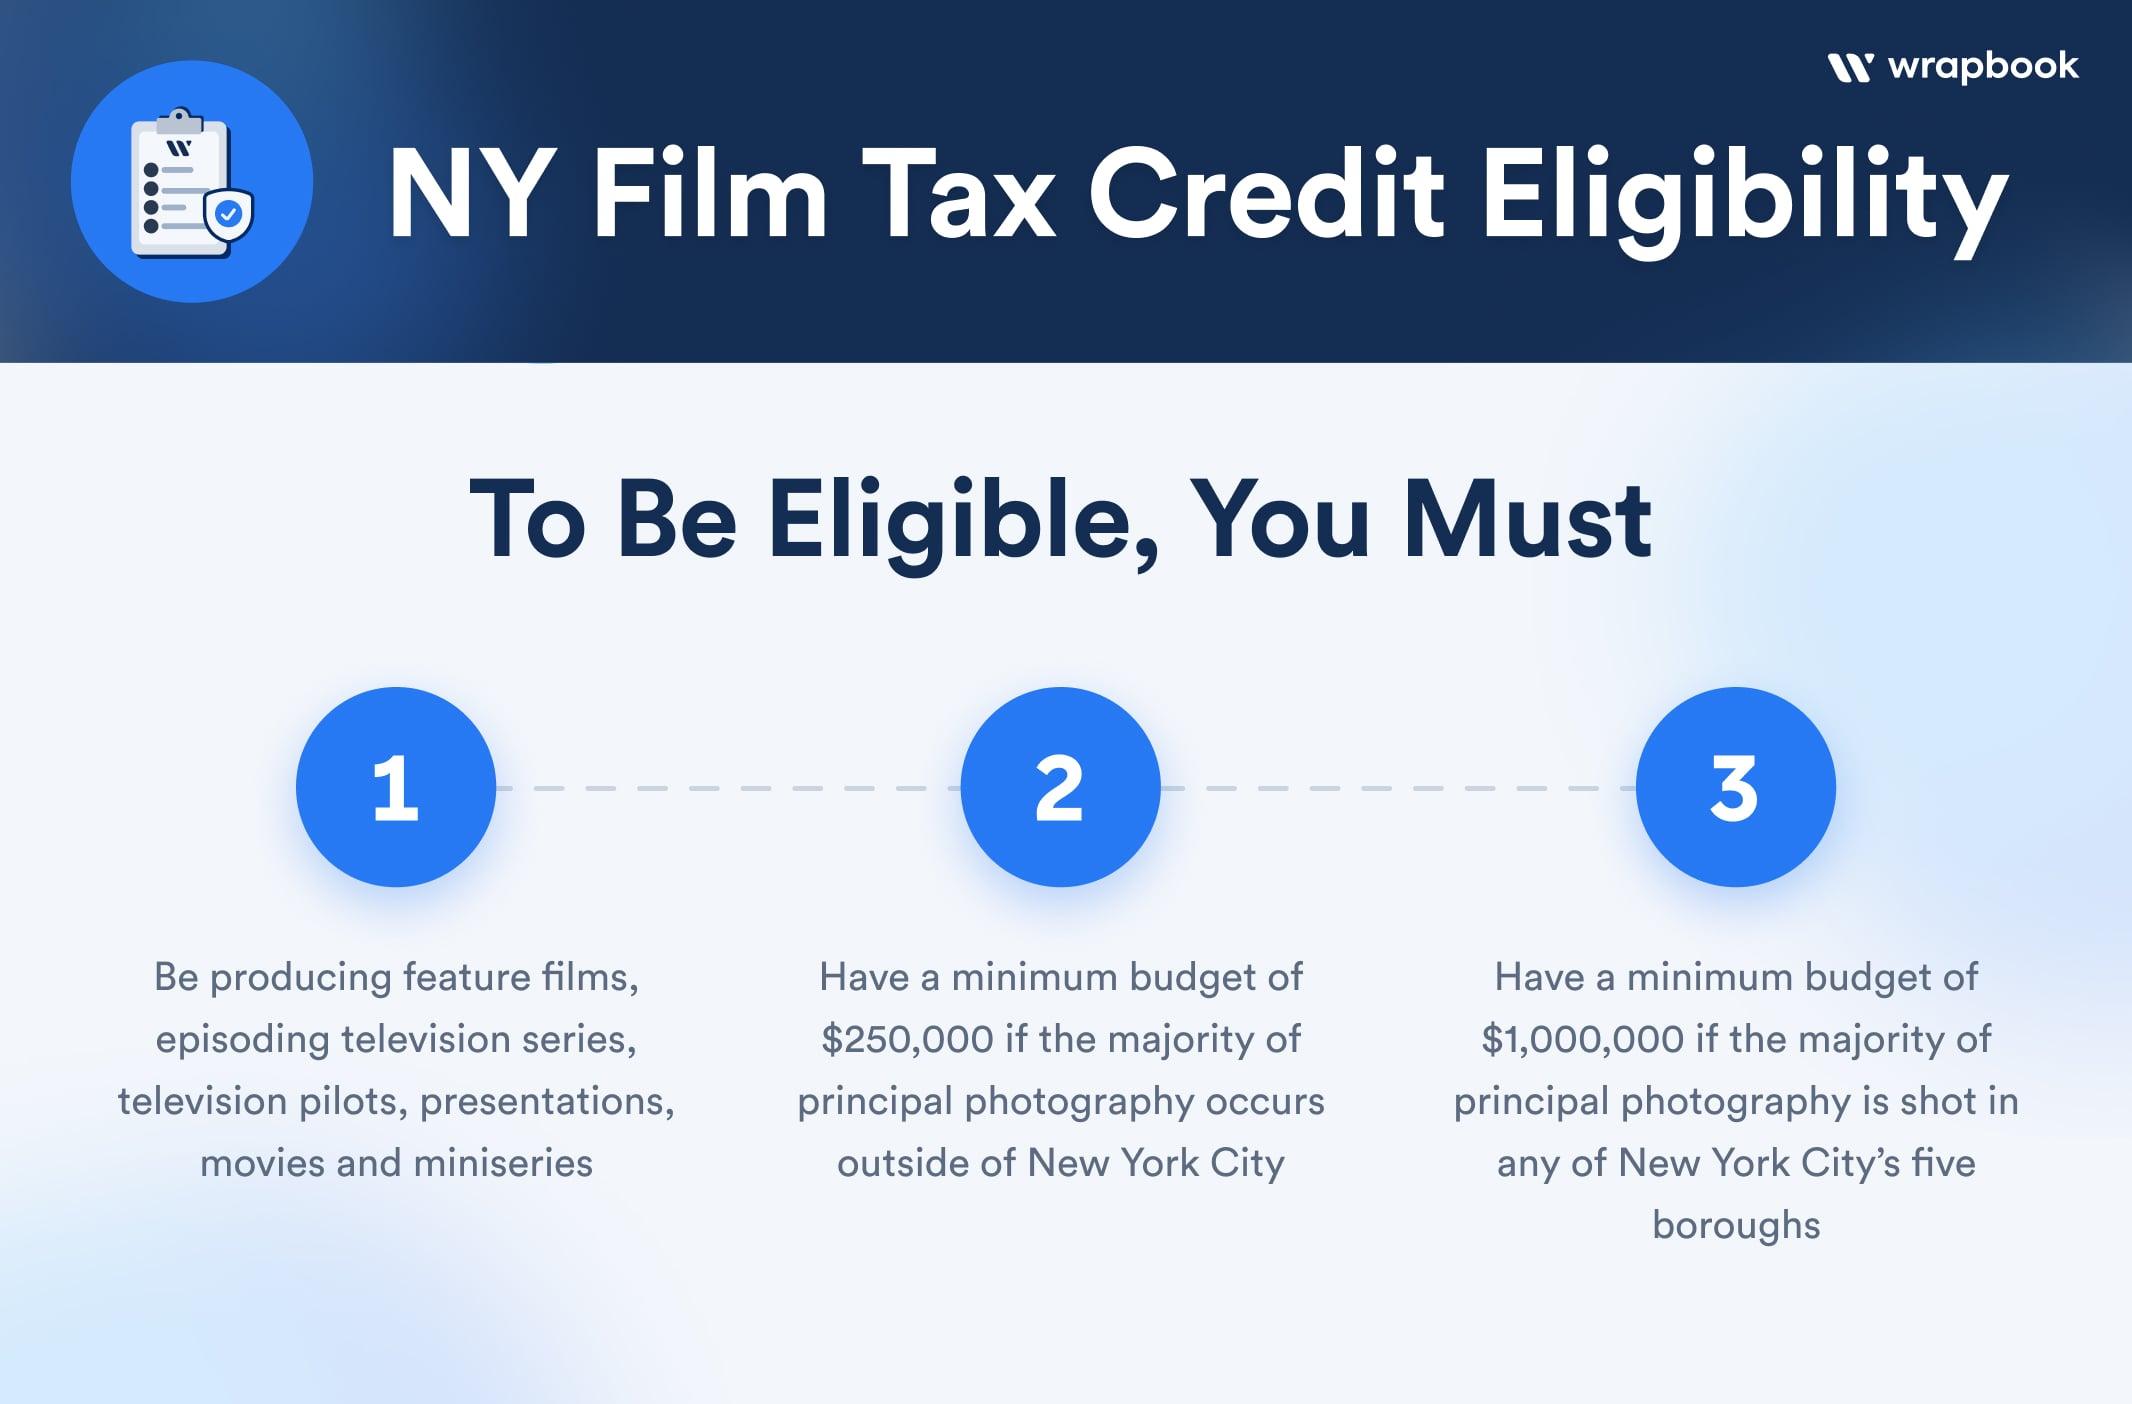 NY Film Tax Credits - Eligibility Infographic - Wrapbook